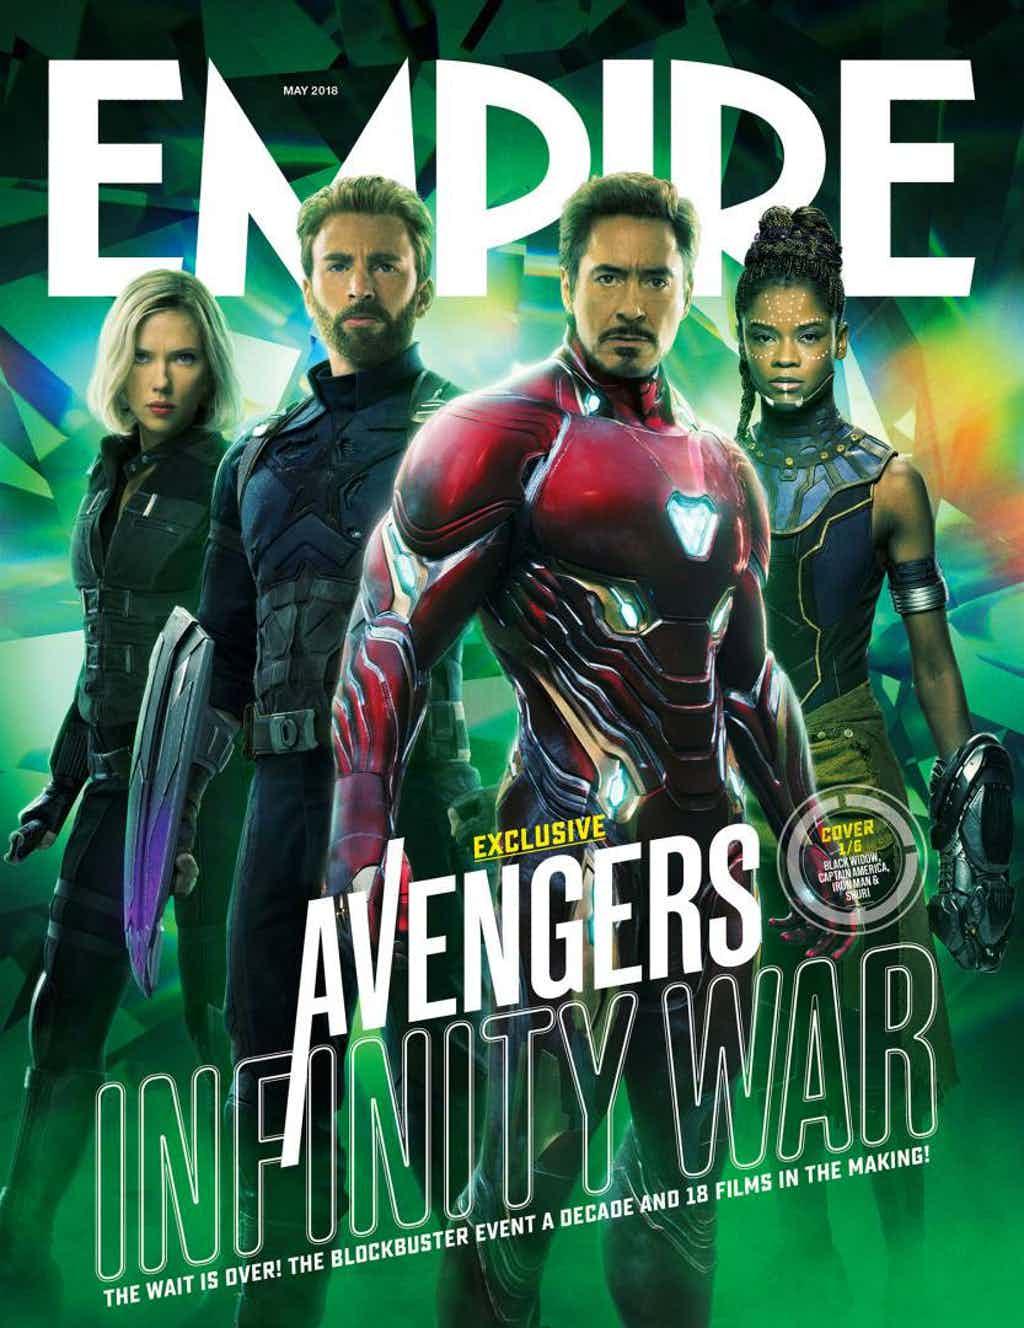 szmk_avengers_bosszuallok_infinity_war_vegtelen_haboru_marvel_empire_4.jpg